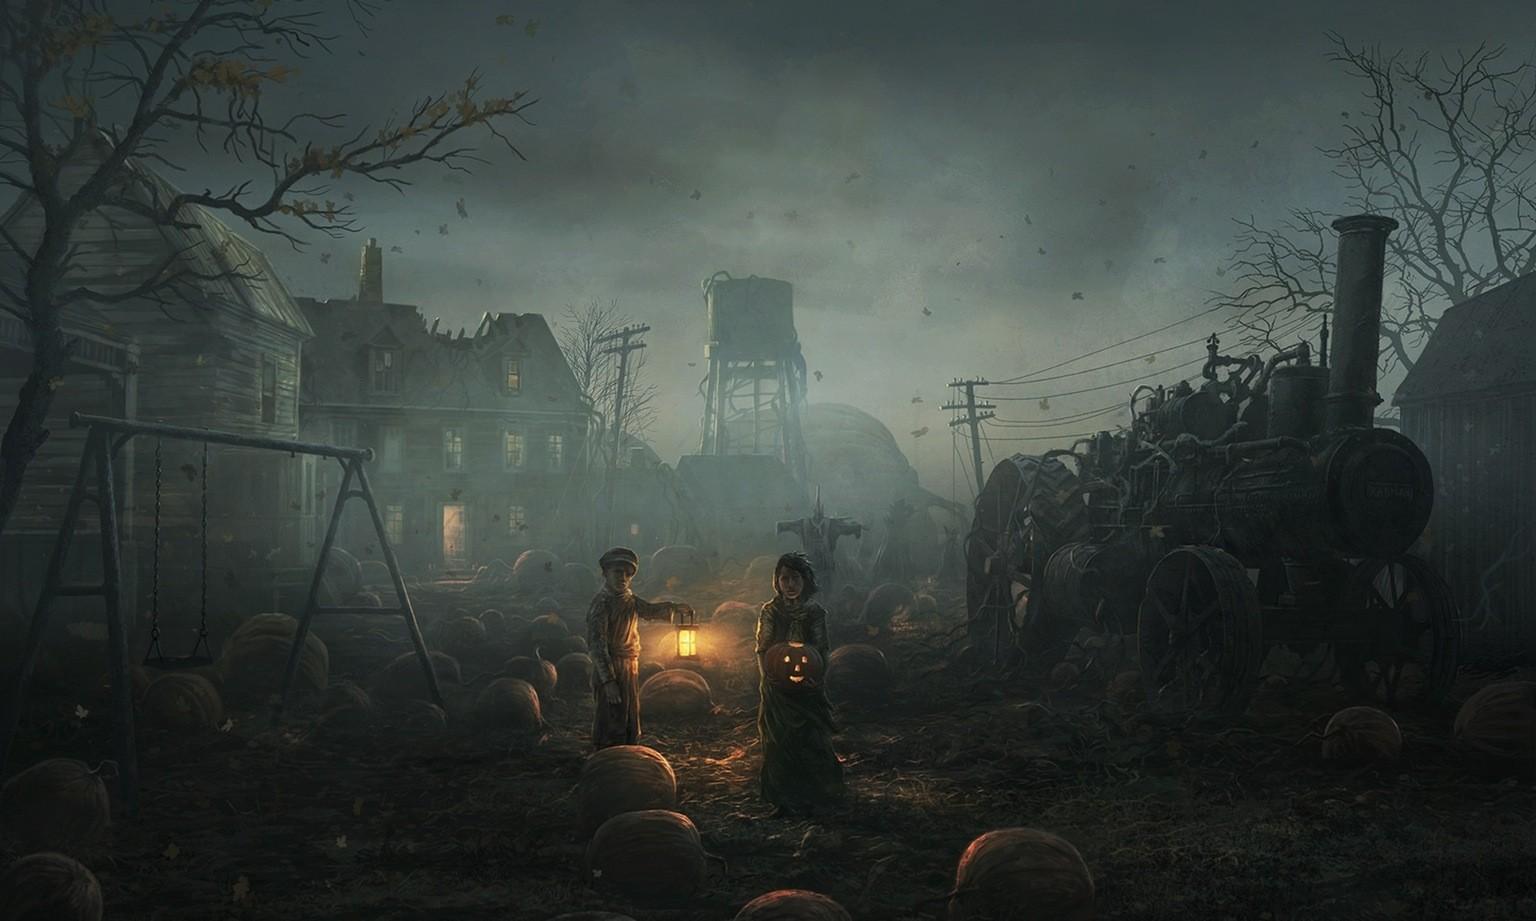 Desktop Wallpaper Full Screen Girls Halloween Spooky Wallpapers Hd Desktop And Mobile